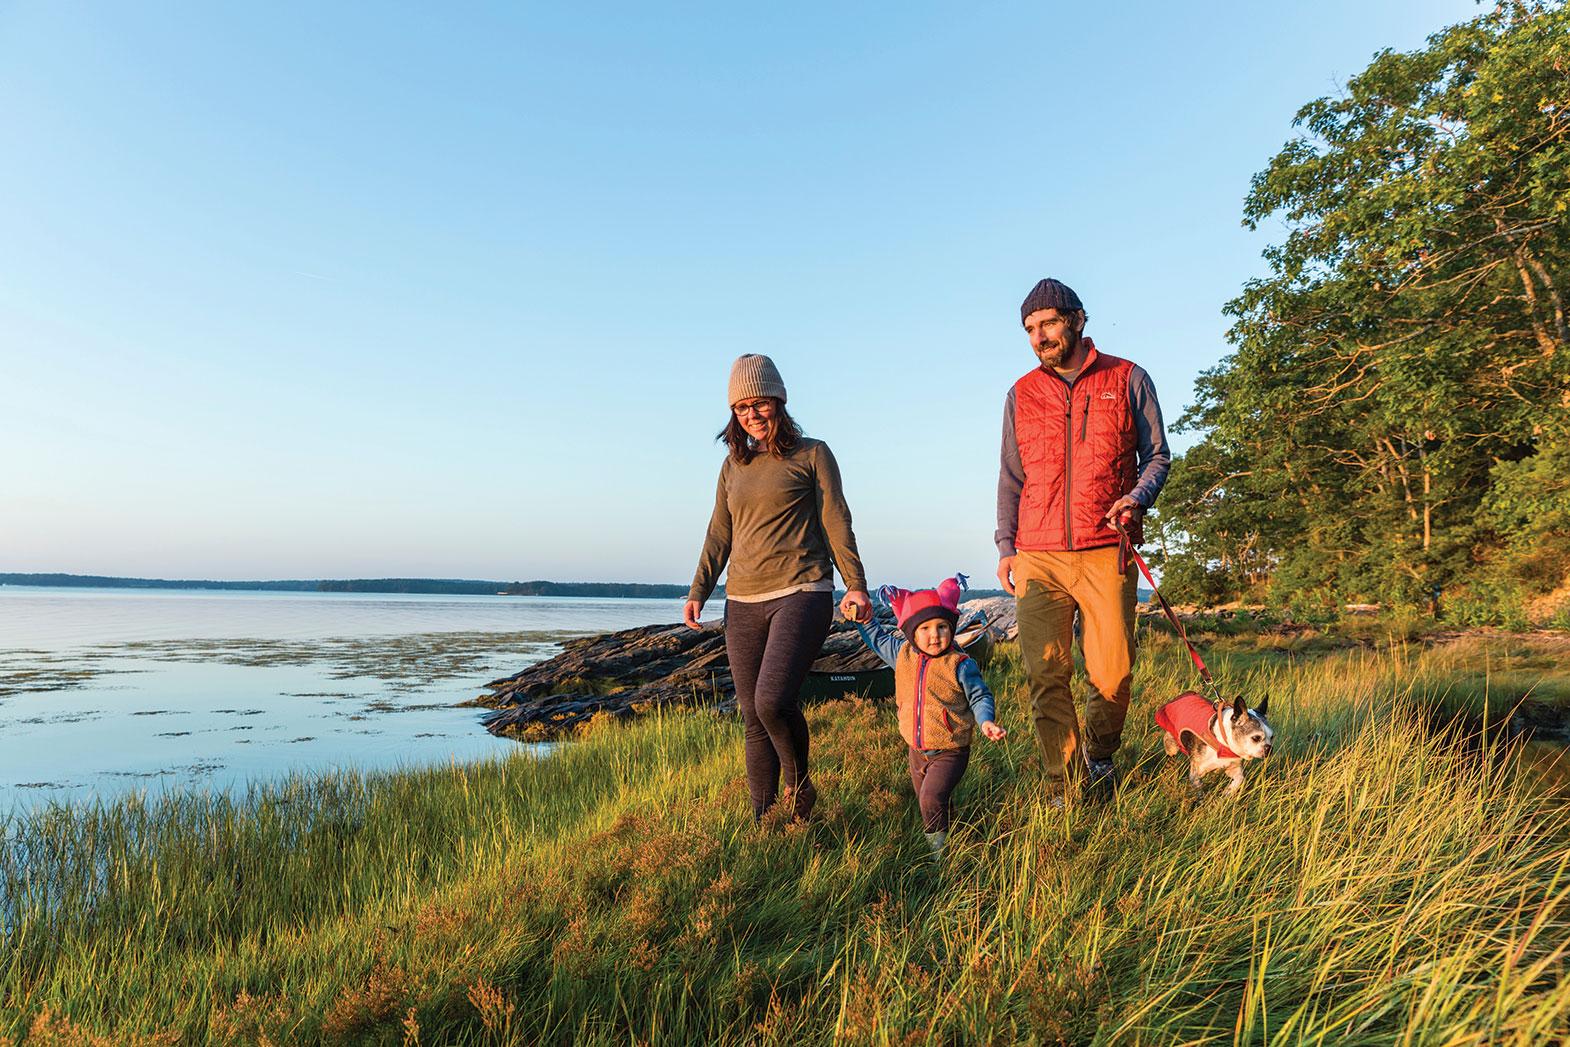 Lanes Island Preserve, Maine